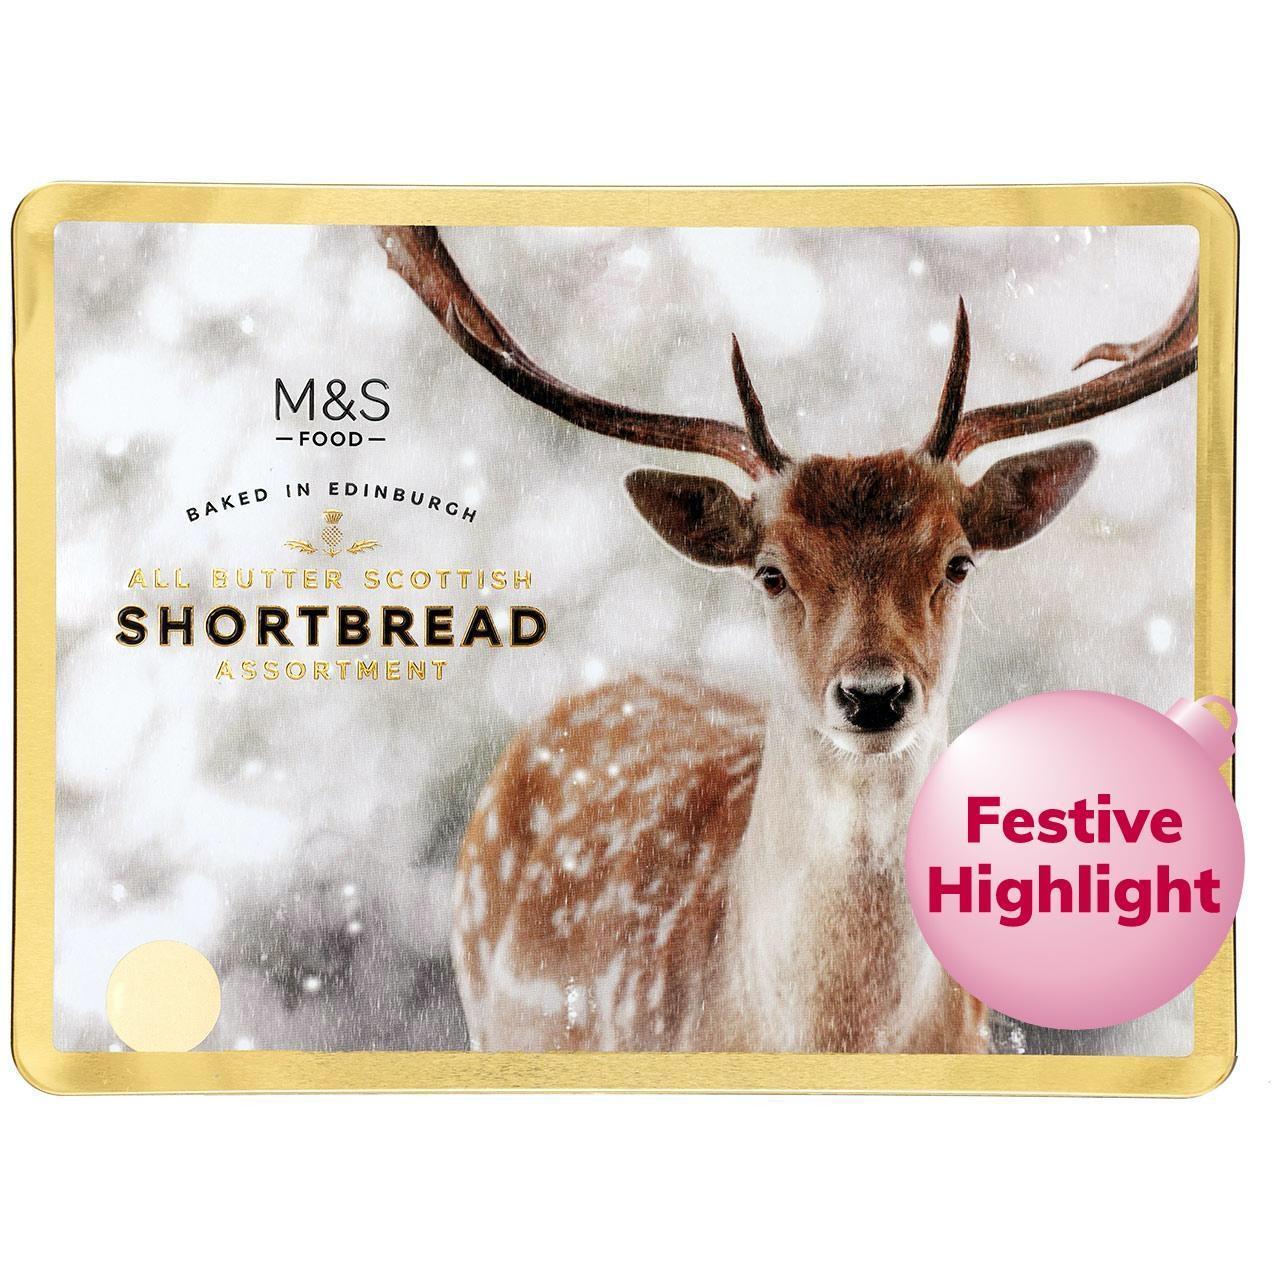 M&S All Butter Scottish Shortbread Assortment 650g £3.66 @ Ocado